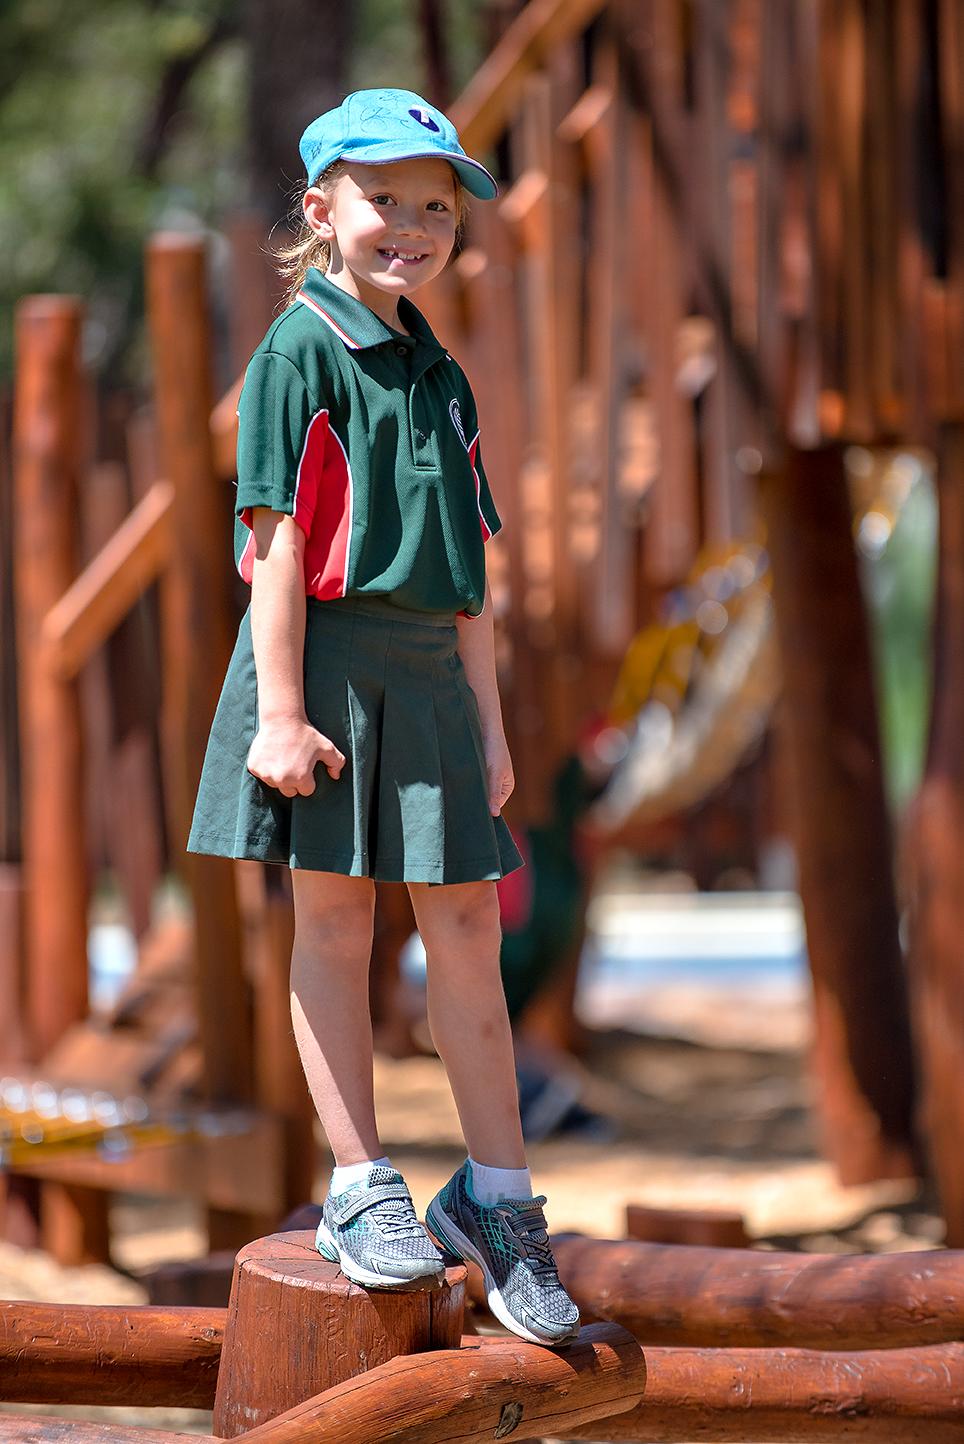 Davallia Primary School - An Independent Public School   school   6 Juniper Way, Duncraig WA 6023, Australia   0894476633 OR +61 8 9447 6633